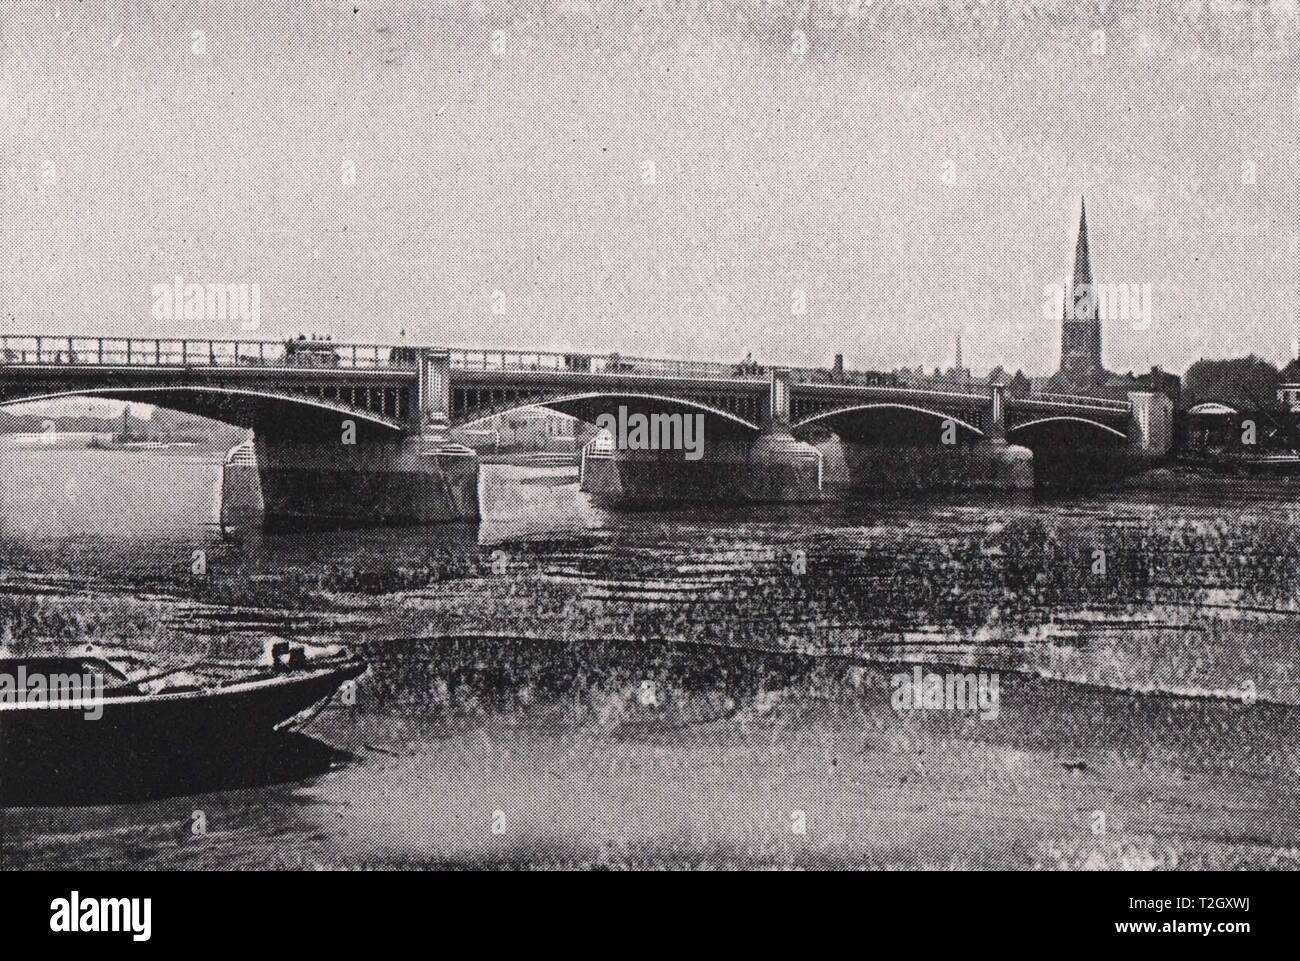 New Vauxhall Bridge (First of London Bridges carrying Trams across) - Stock Image